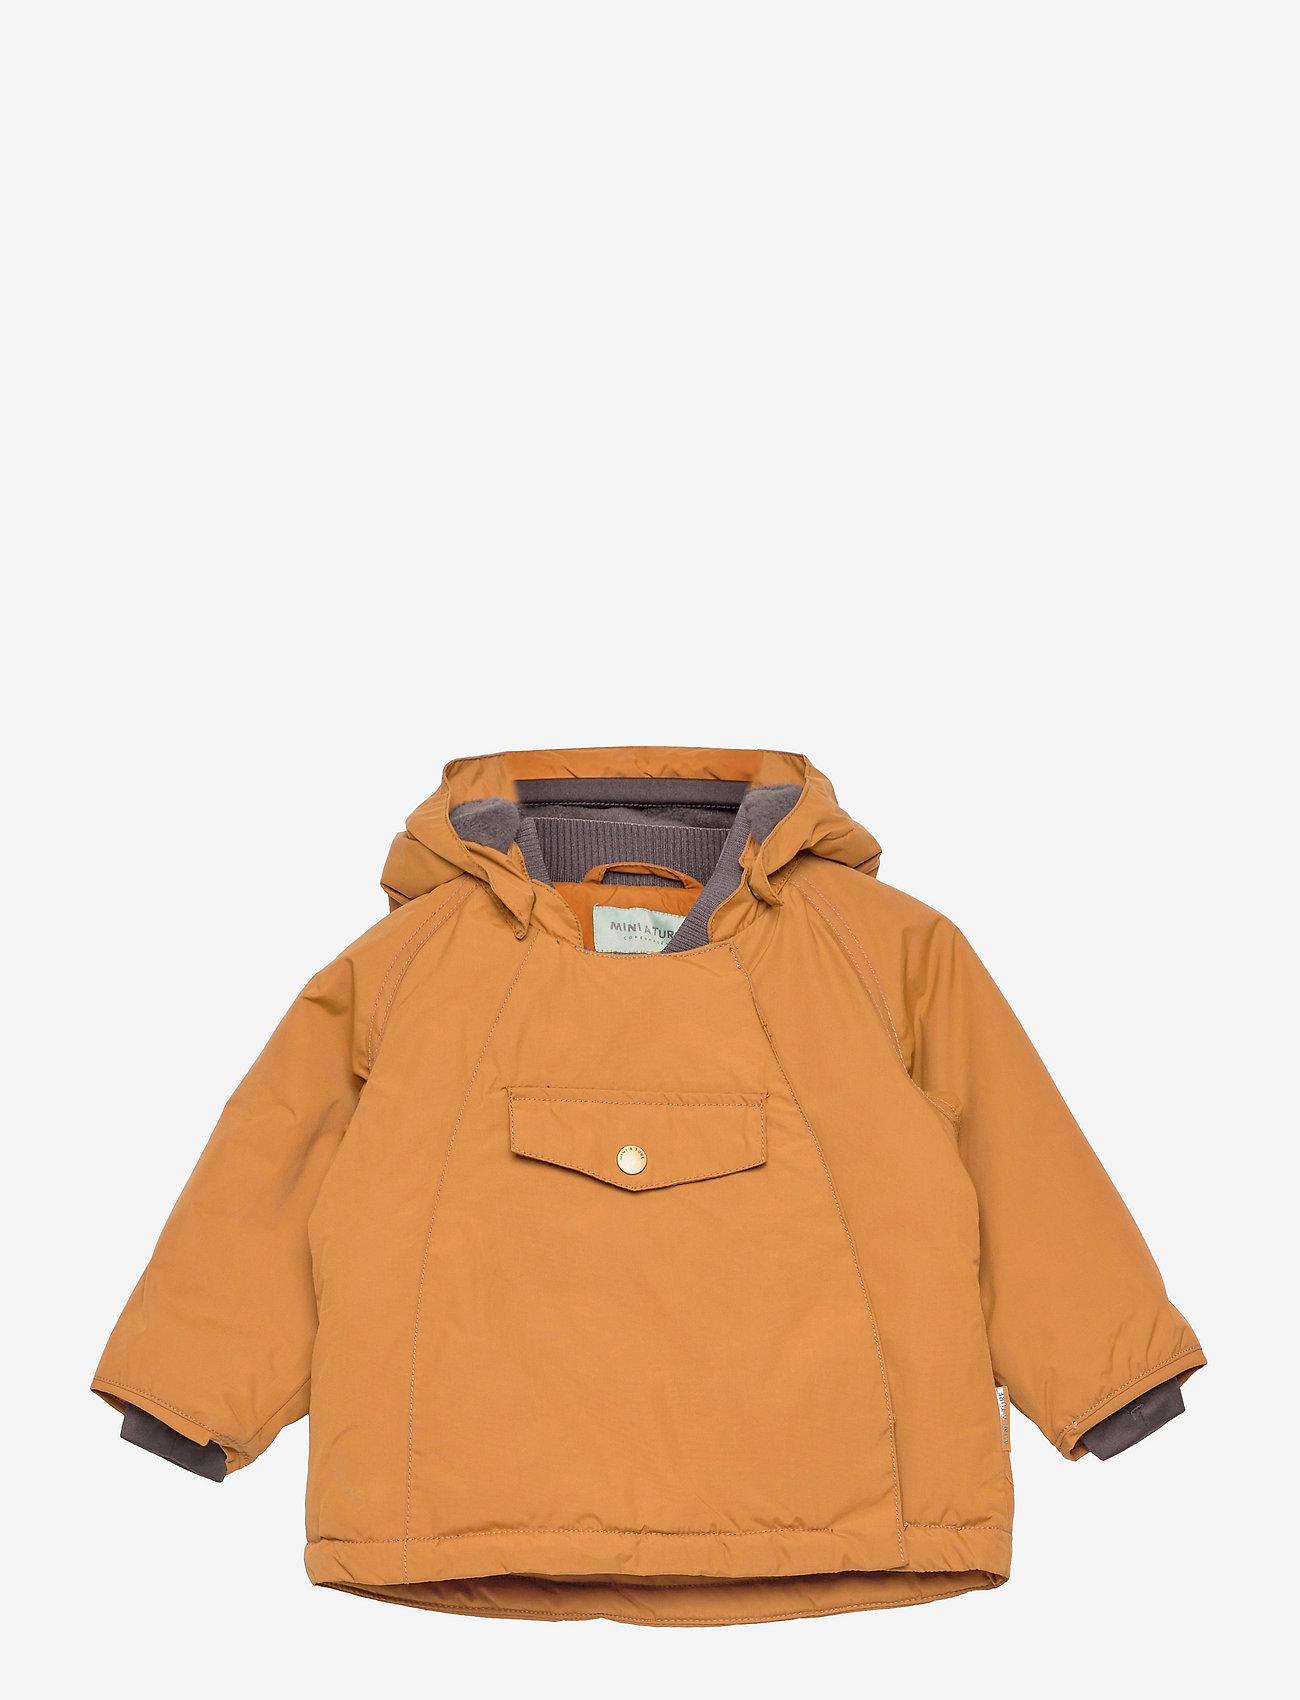 Mini A Ture - Wang Jacket, M - winter jacket - rubber brown - 0